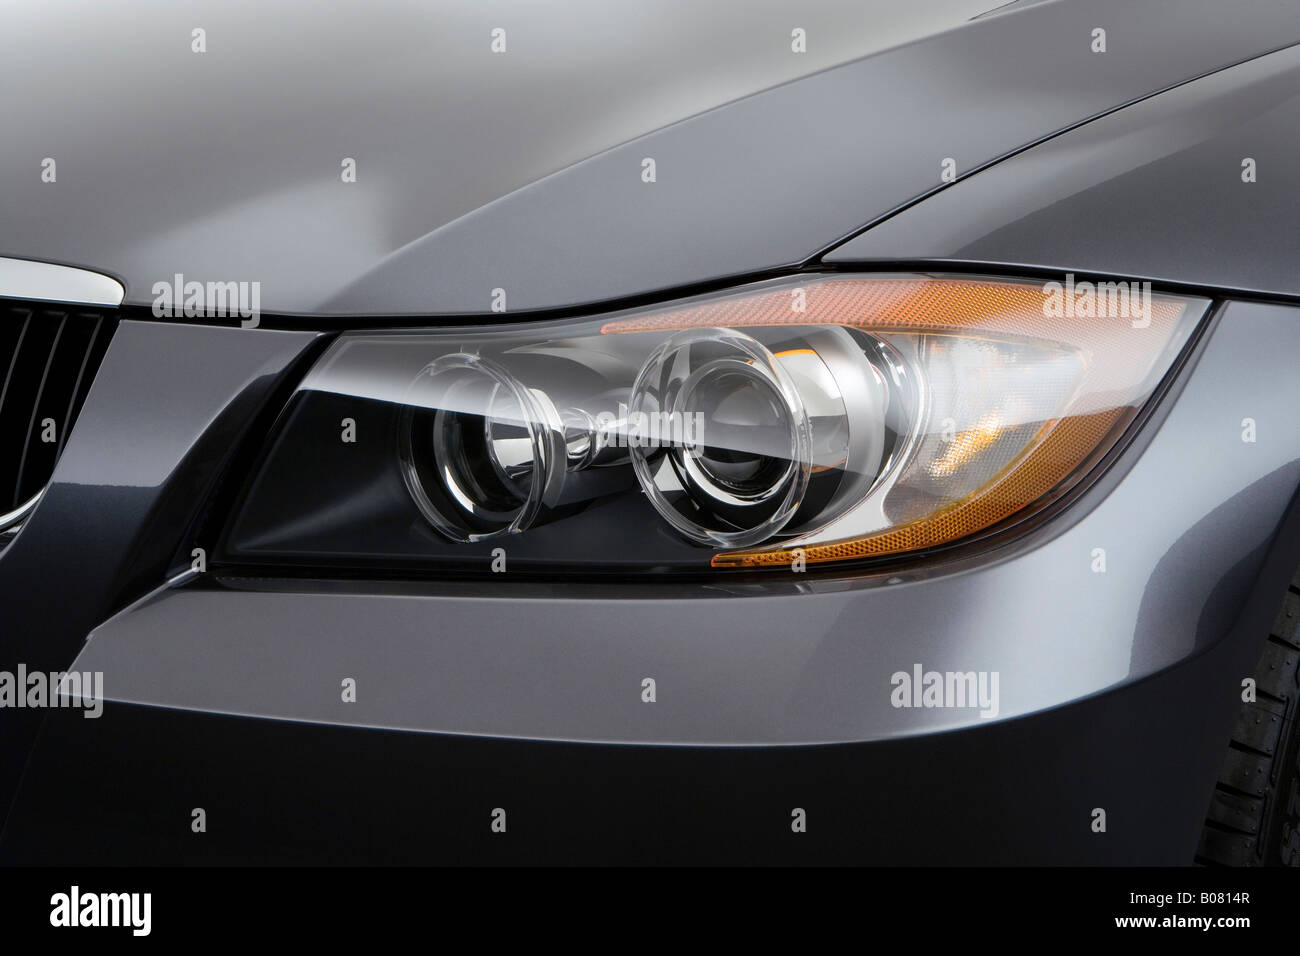 2008 Bmw 3 Series 328i In Gray Headlight Stock Photo Alamy